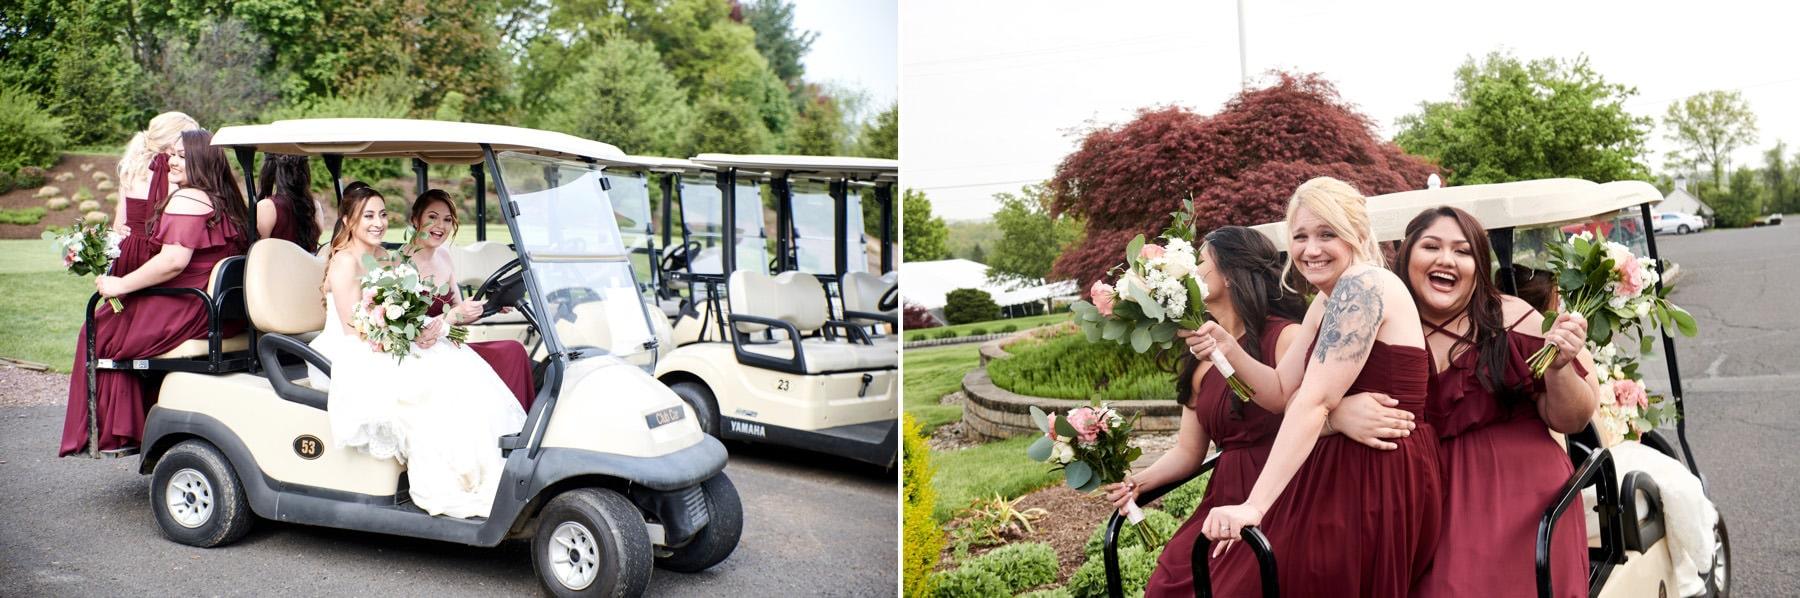 basking ridge country club wedding golf carts